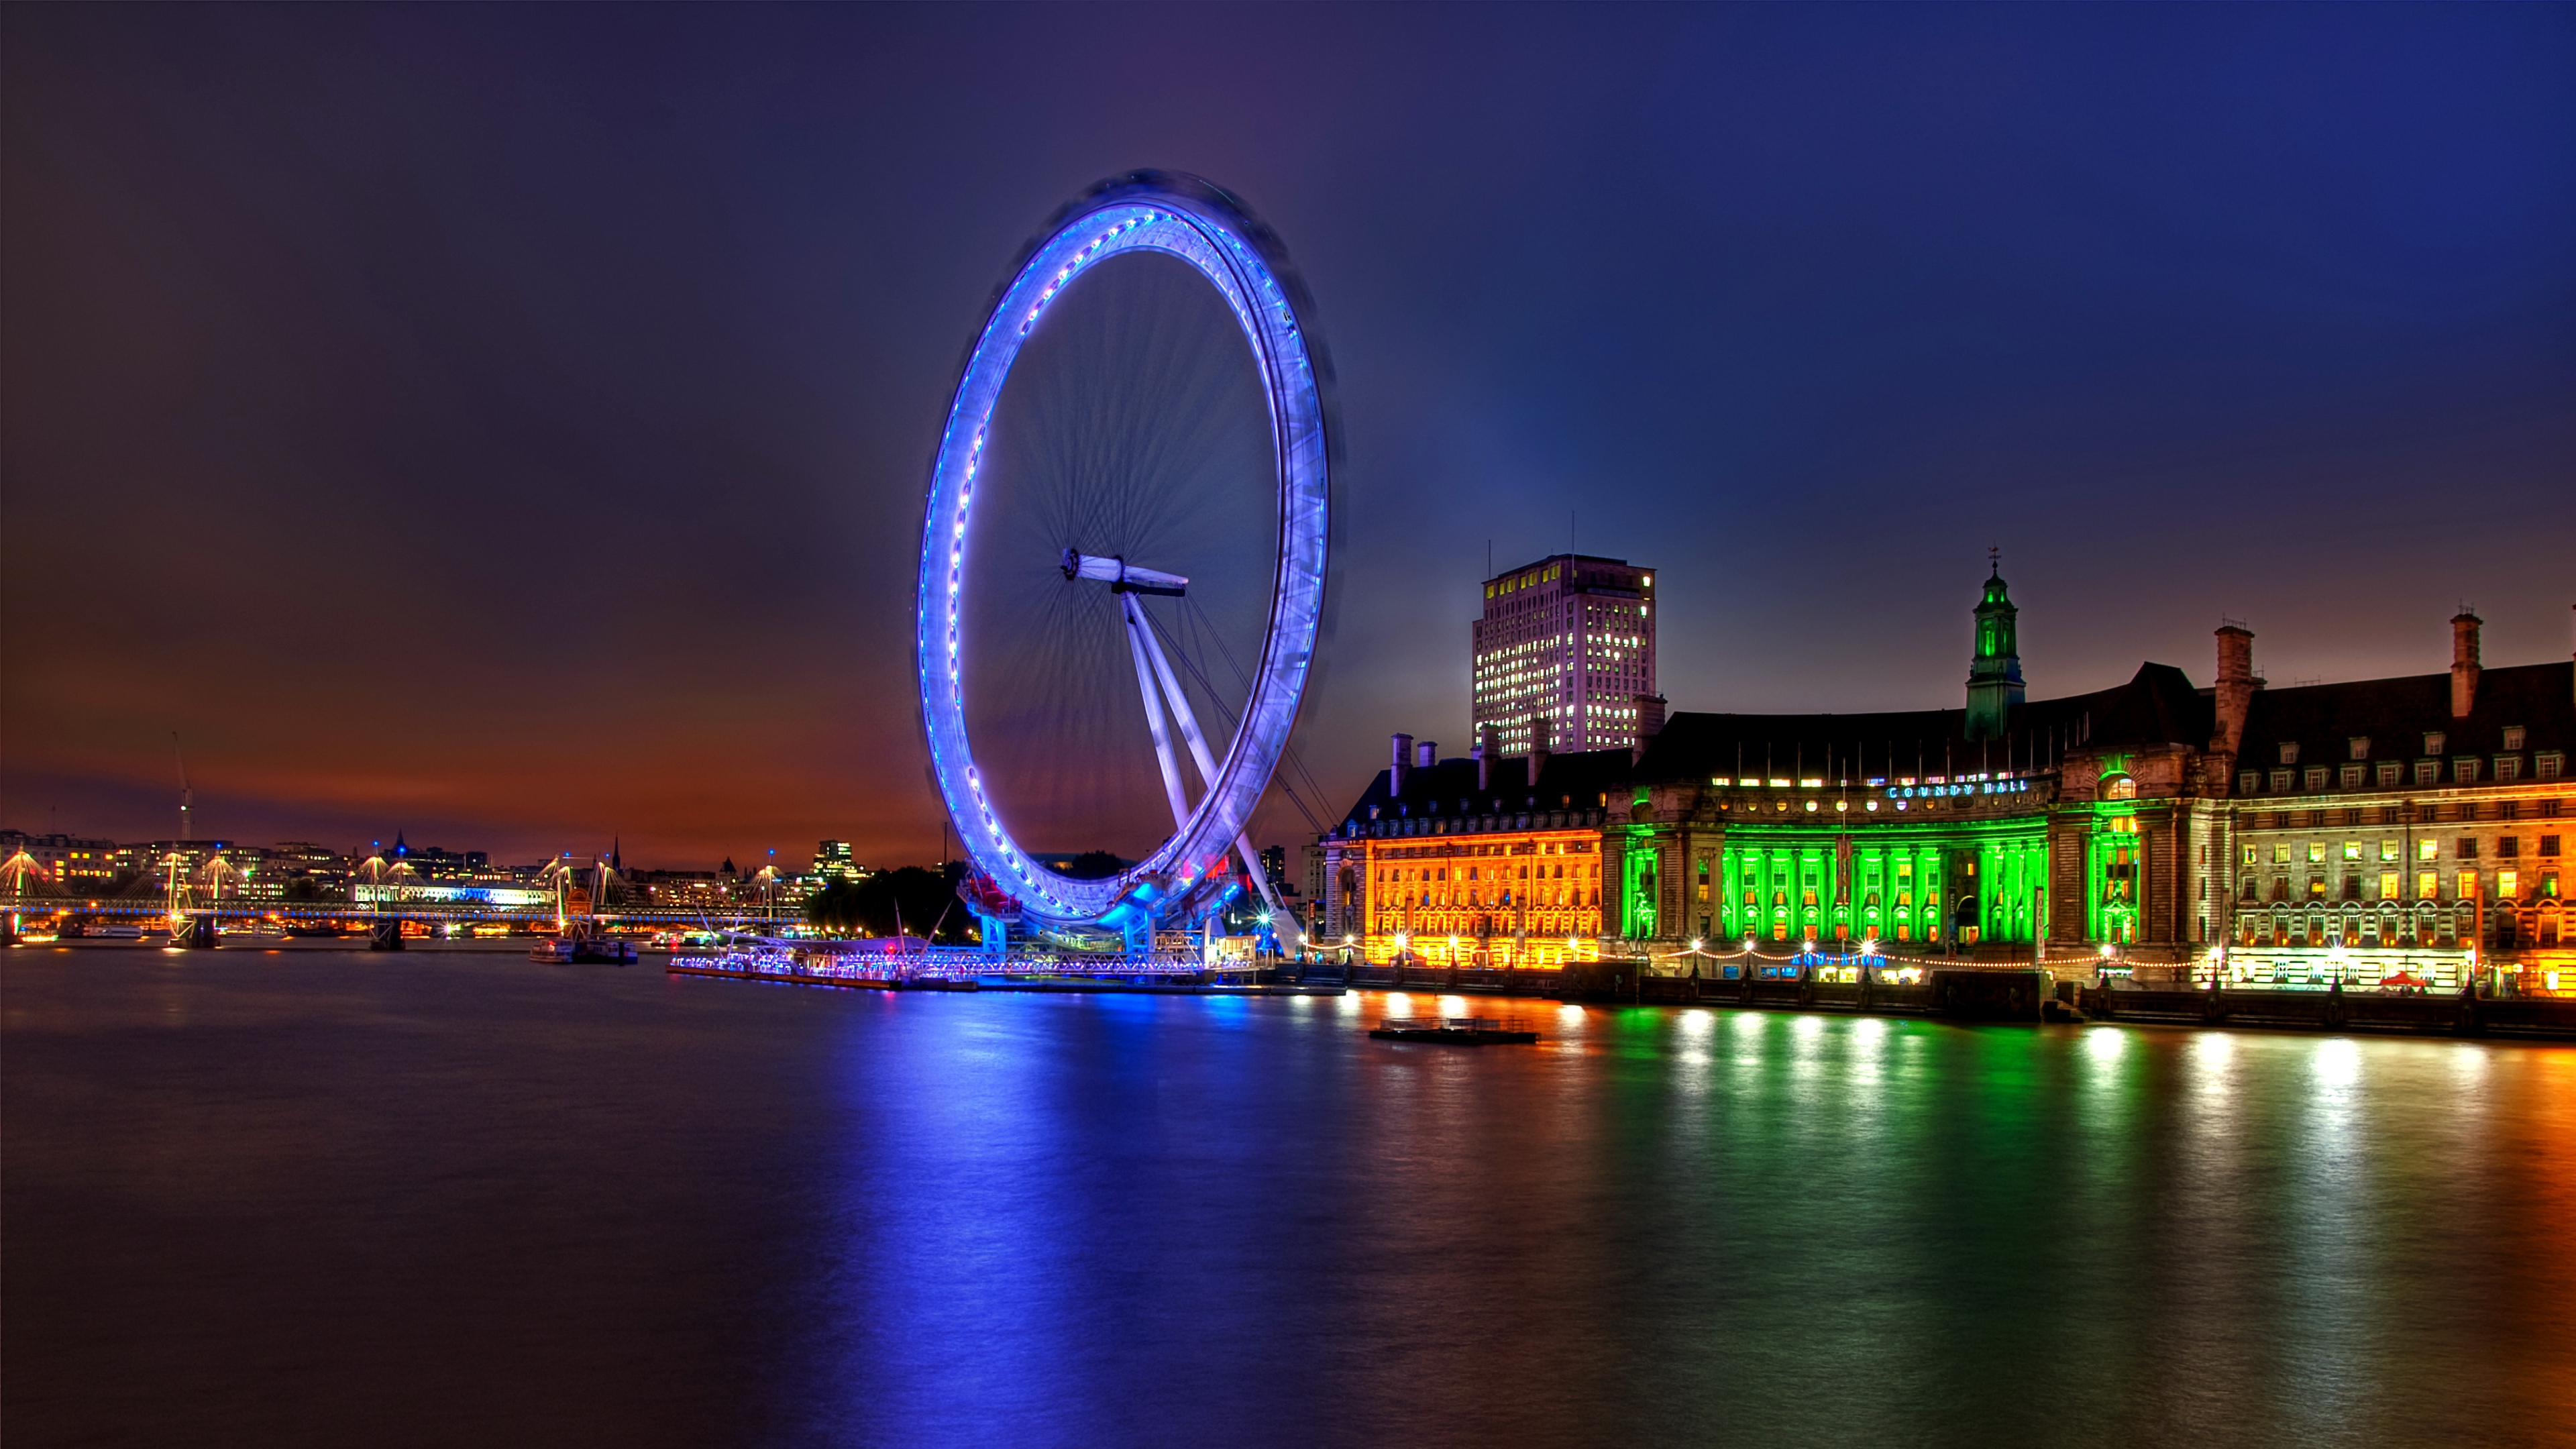 uk england london capital ferris wheel night building architecture lights river thames 4k 1538068156 - uk, england, london, capital, ferris wheel, night, building, architecture, lights, river, thames 4k - uk, London, England